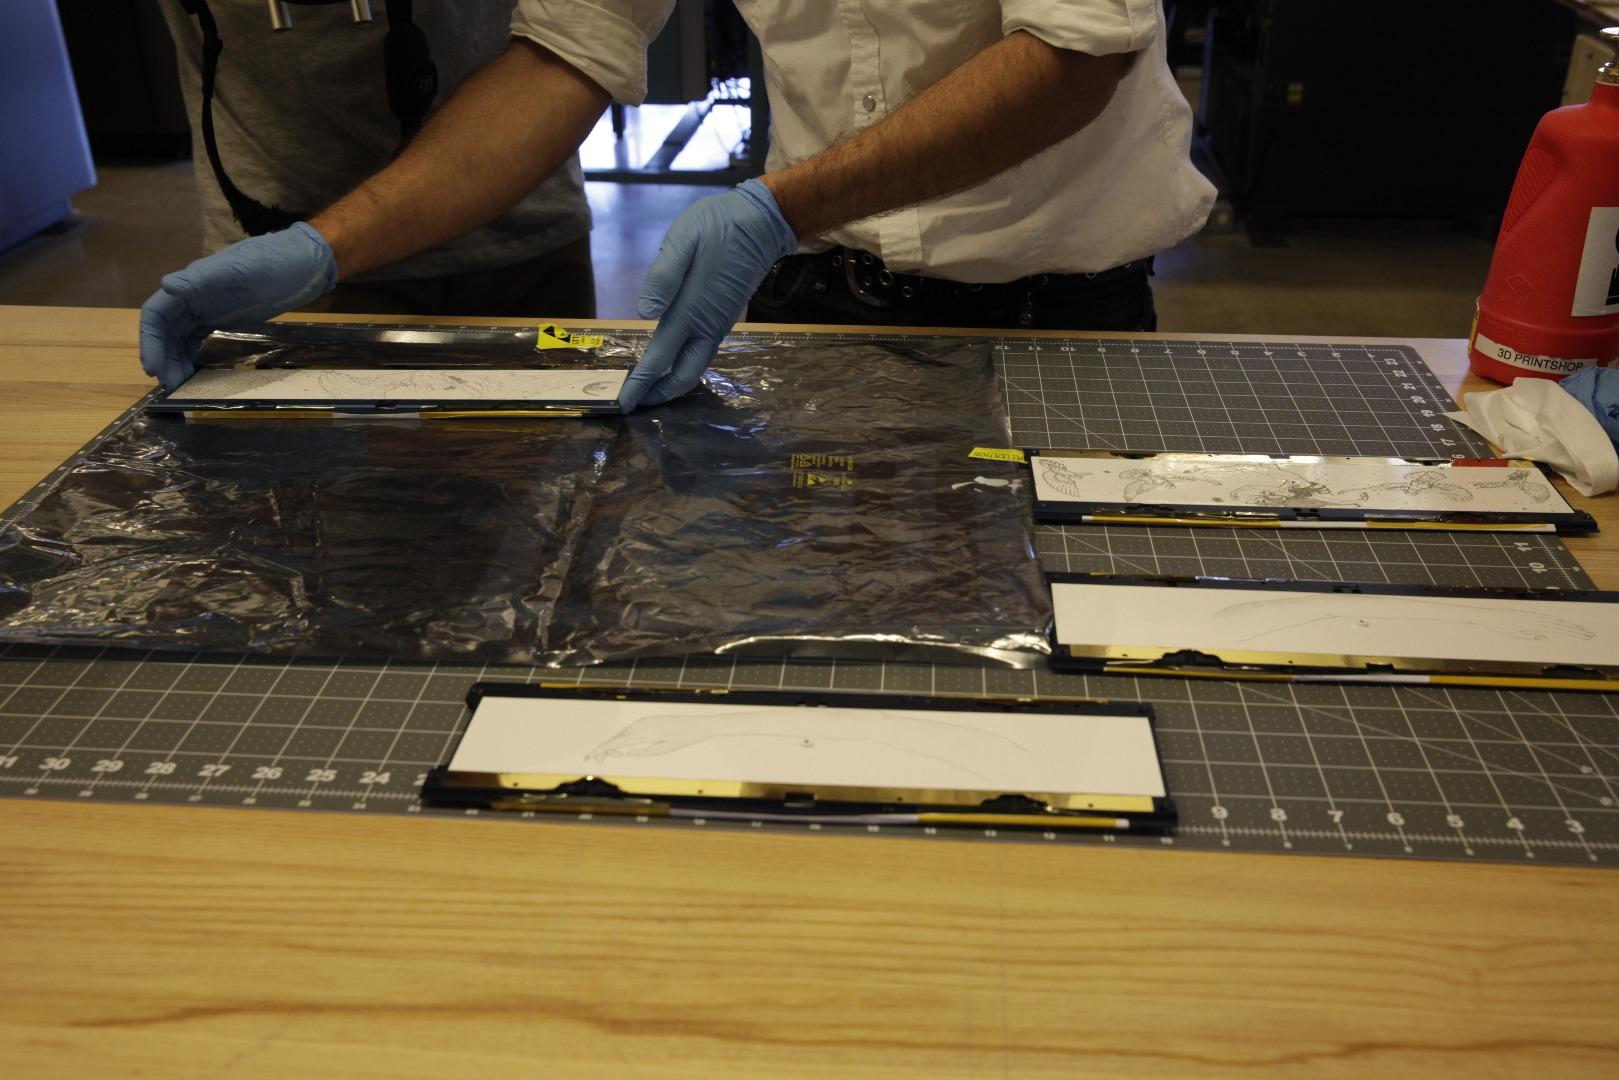 Picture of Laser Engrave Artwork on Aluminum Side Panels